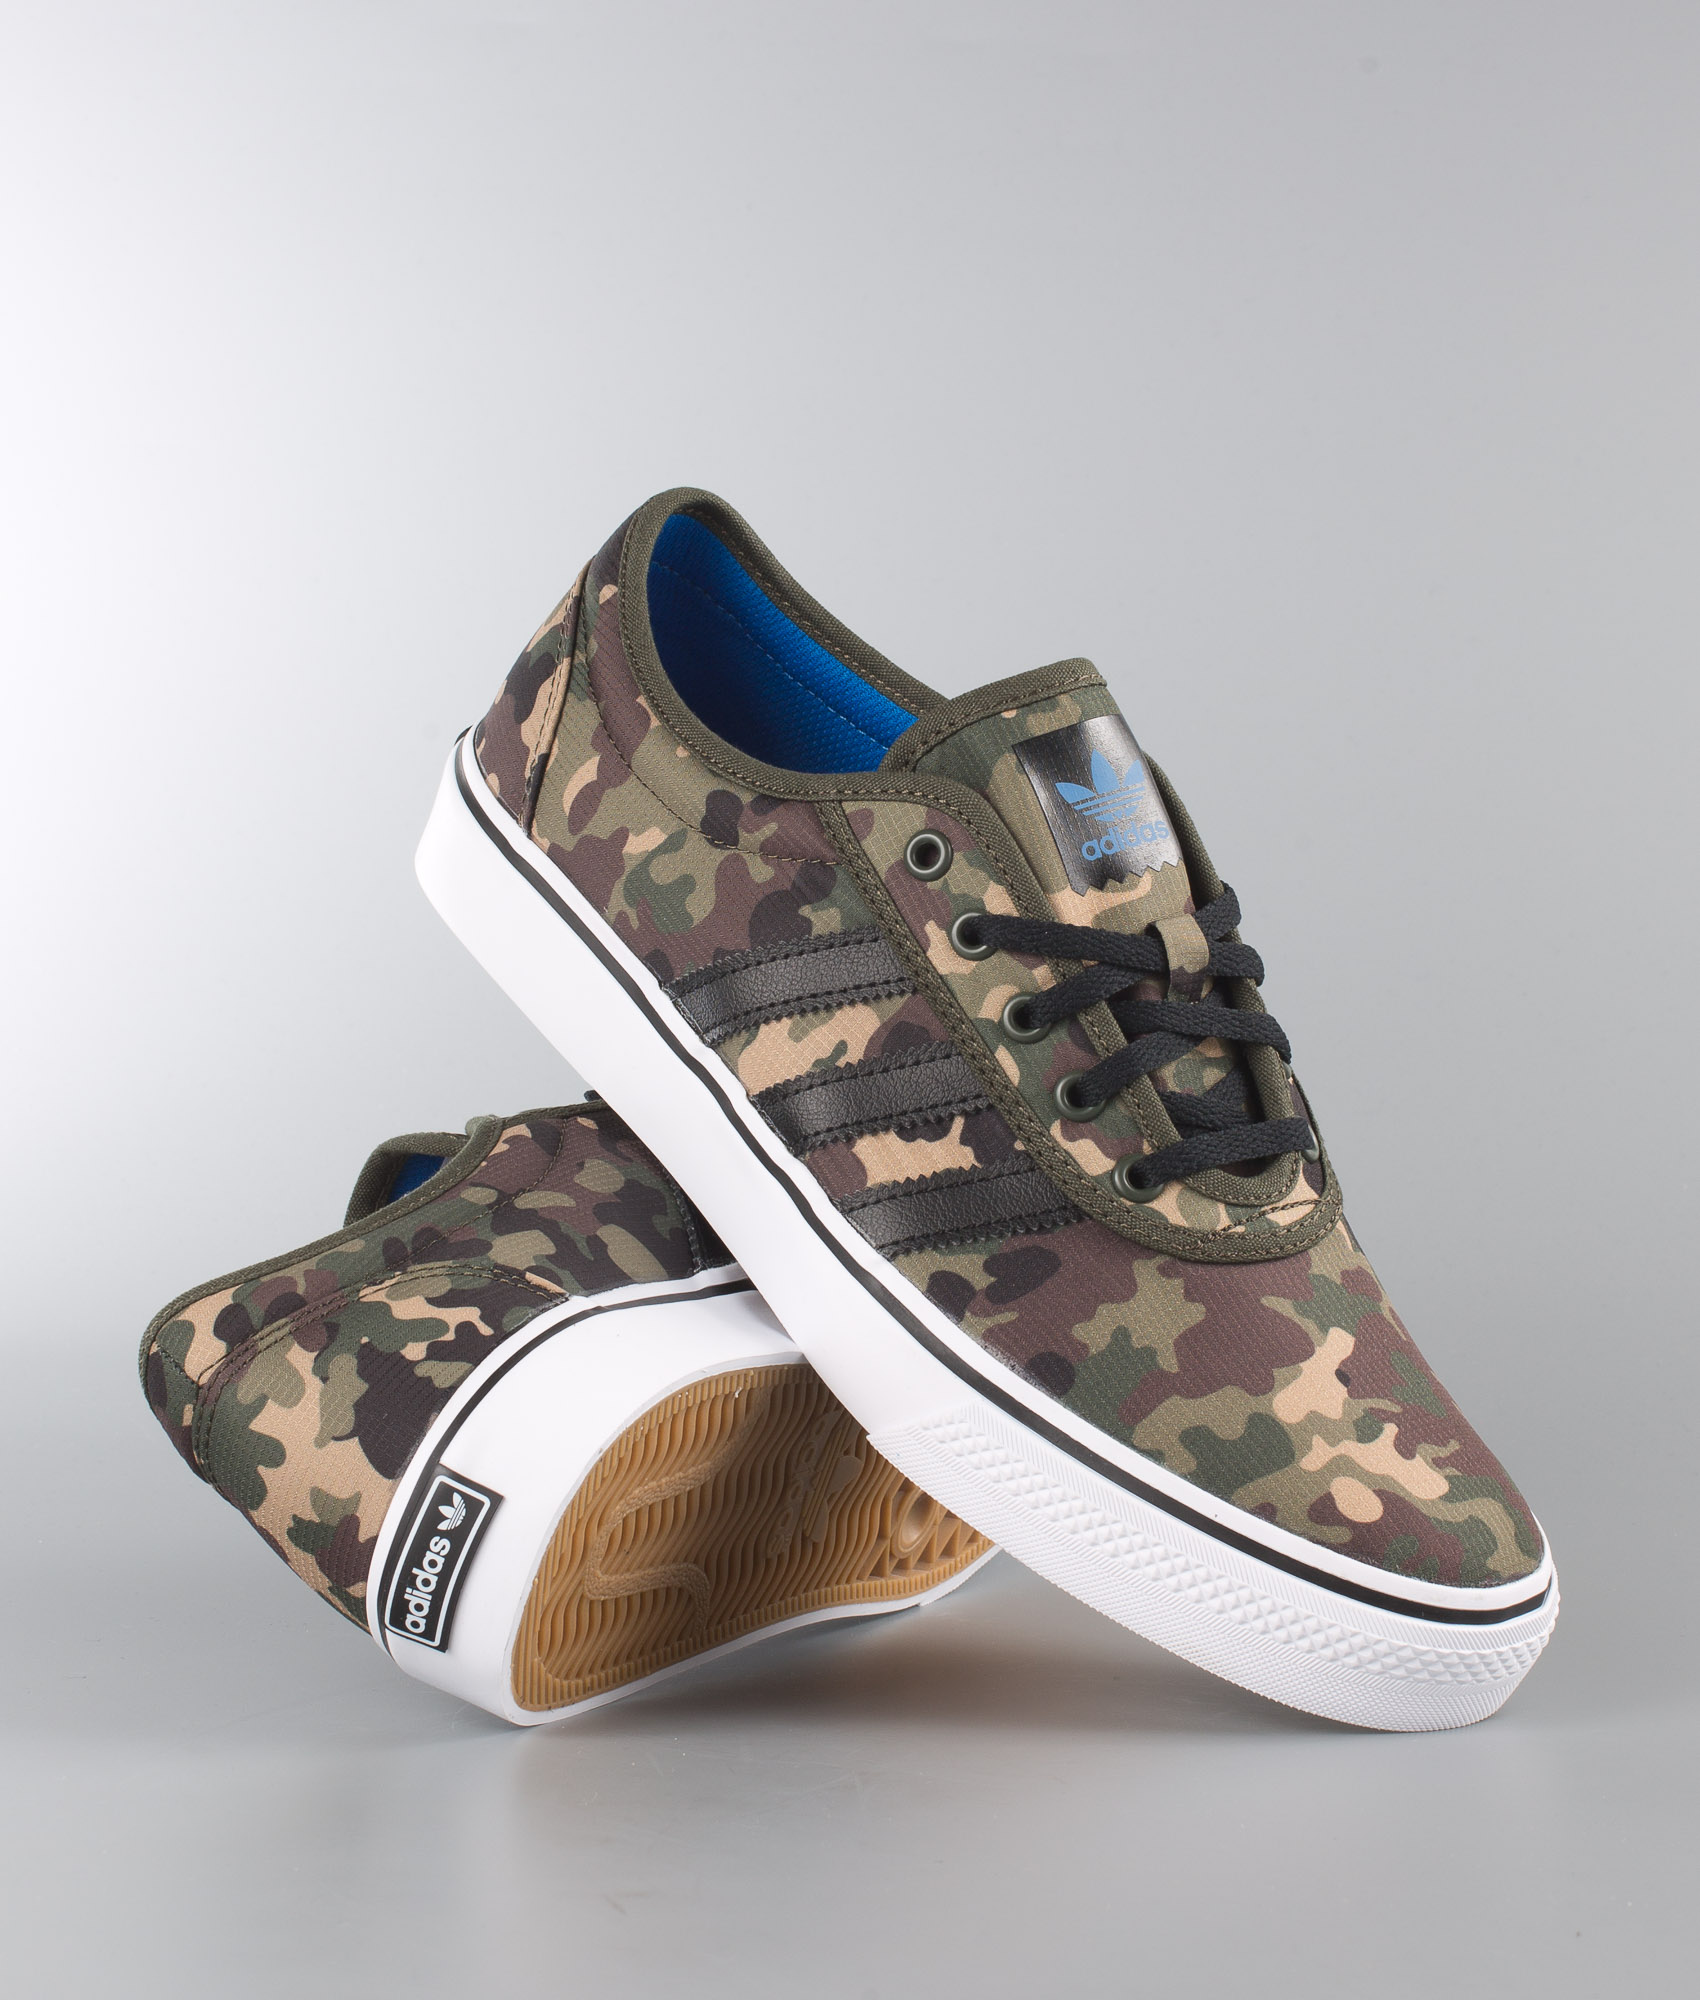 Skateboarding Ease Chaussures Adi Adidas Ngtcarcblackftwwht xoeQdCWErB